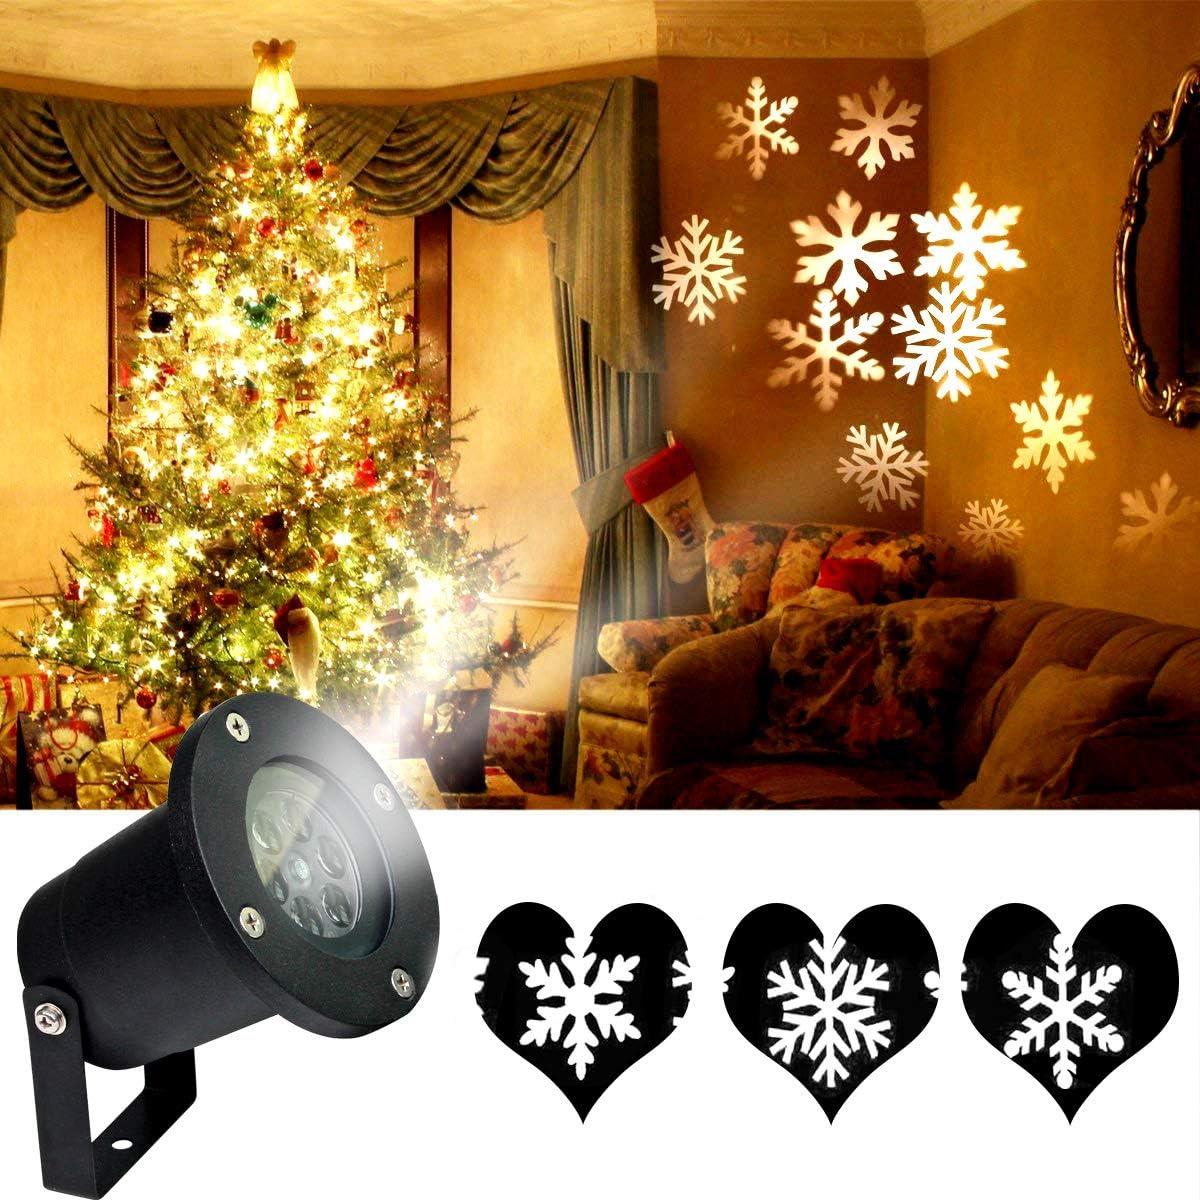 Christmas LED Laser Snowflake Projector Xmas Garden Snow Landscape Decor Lamp US